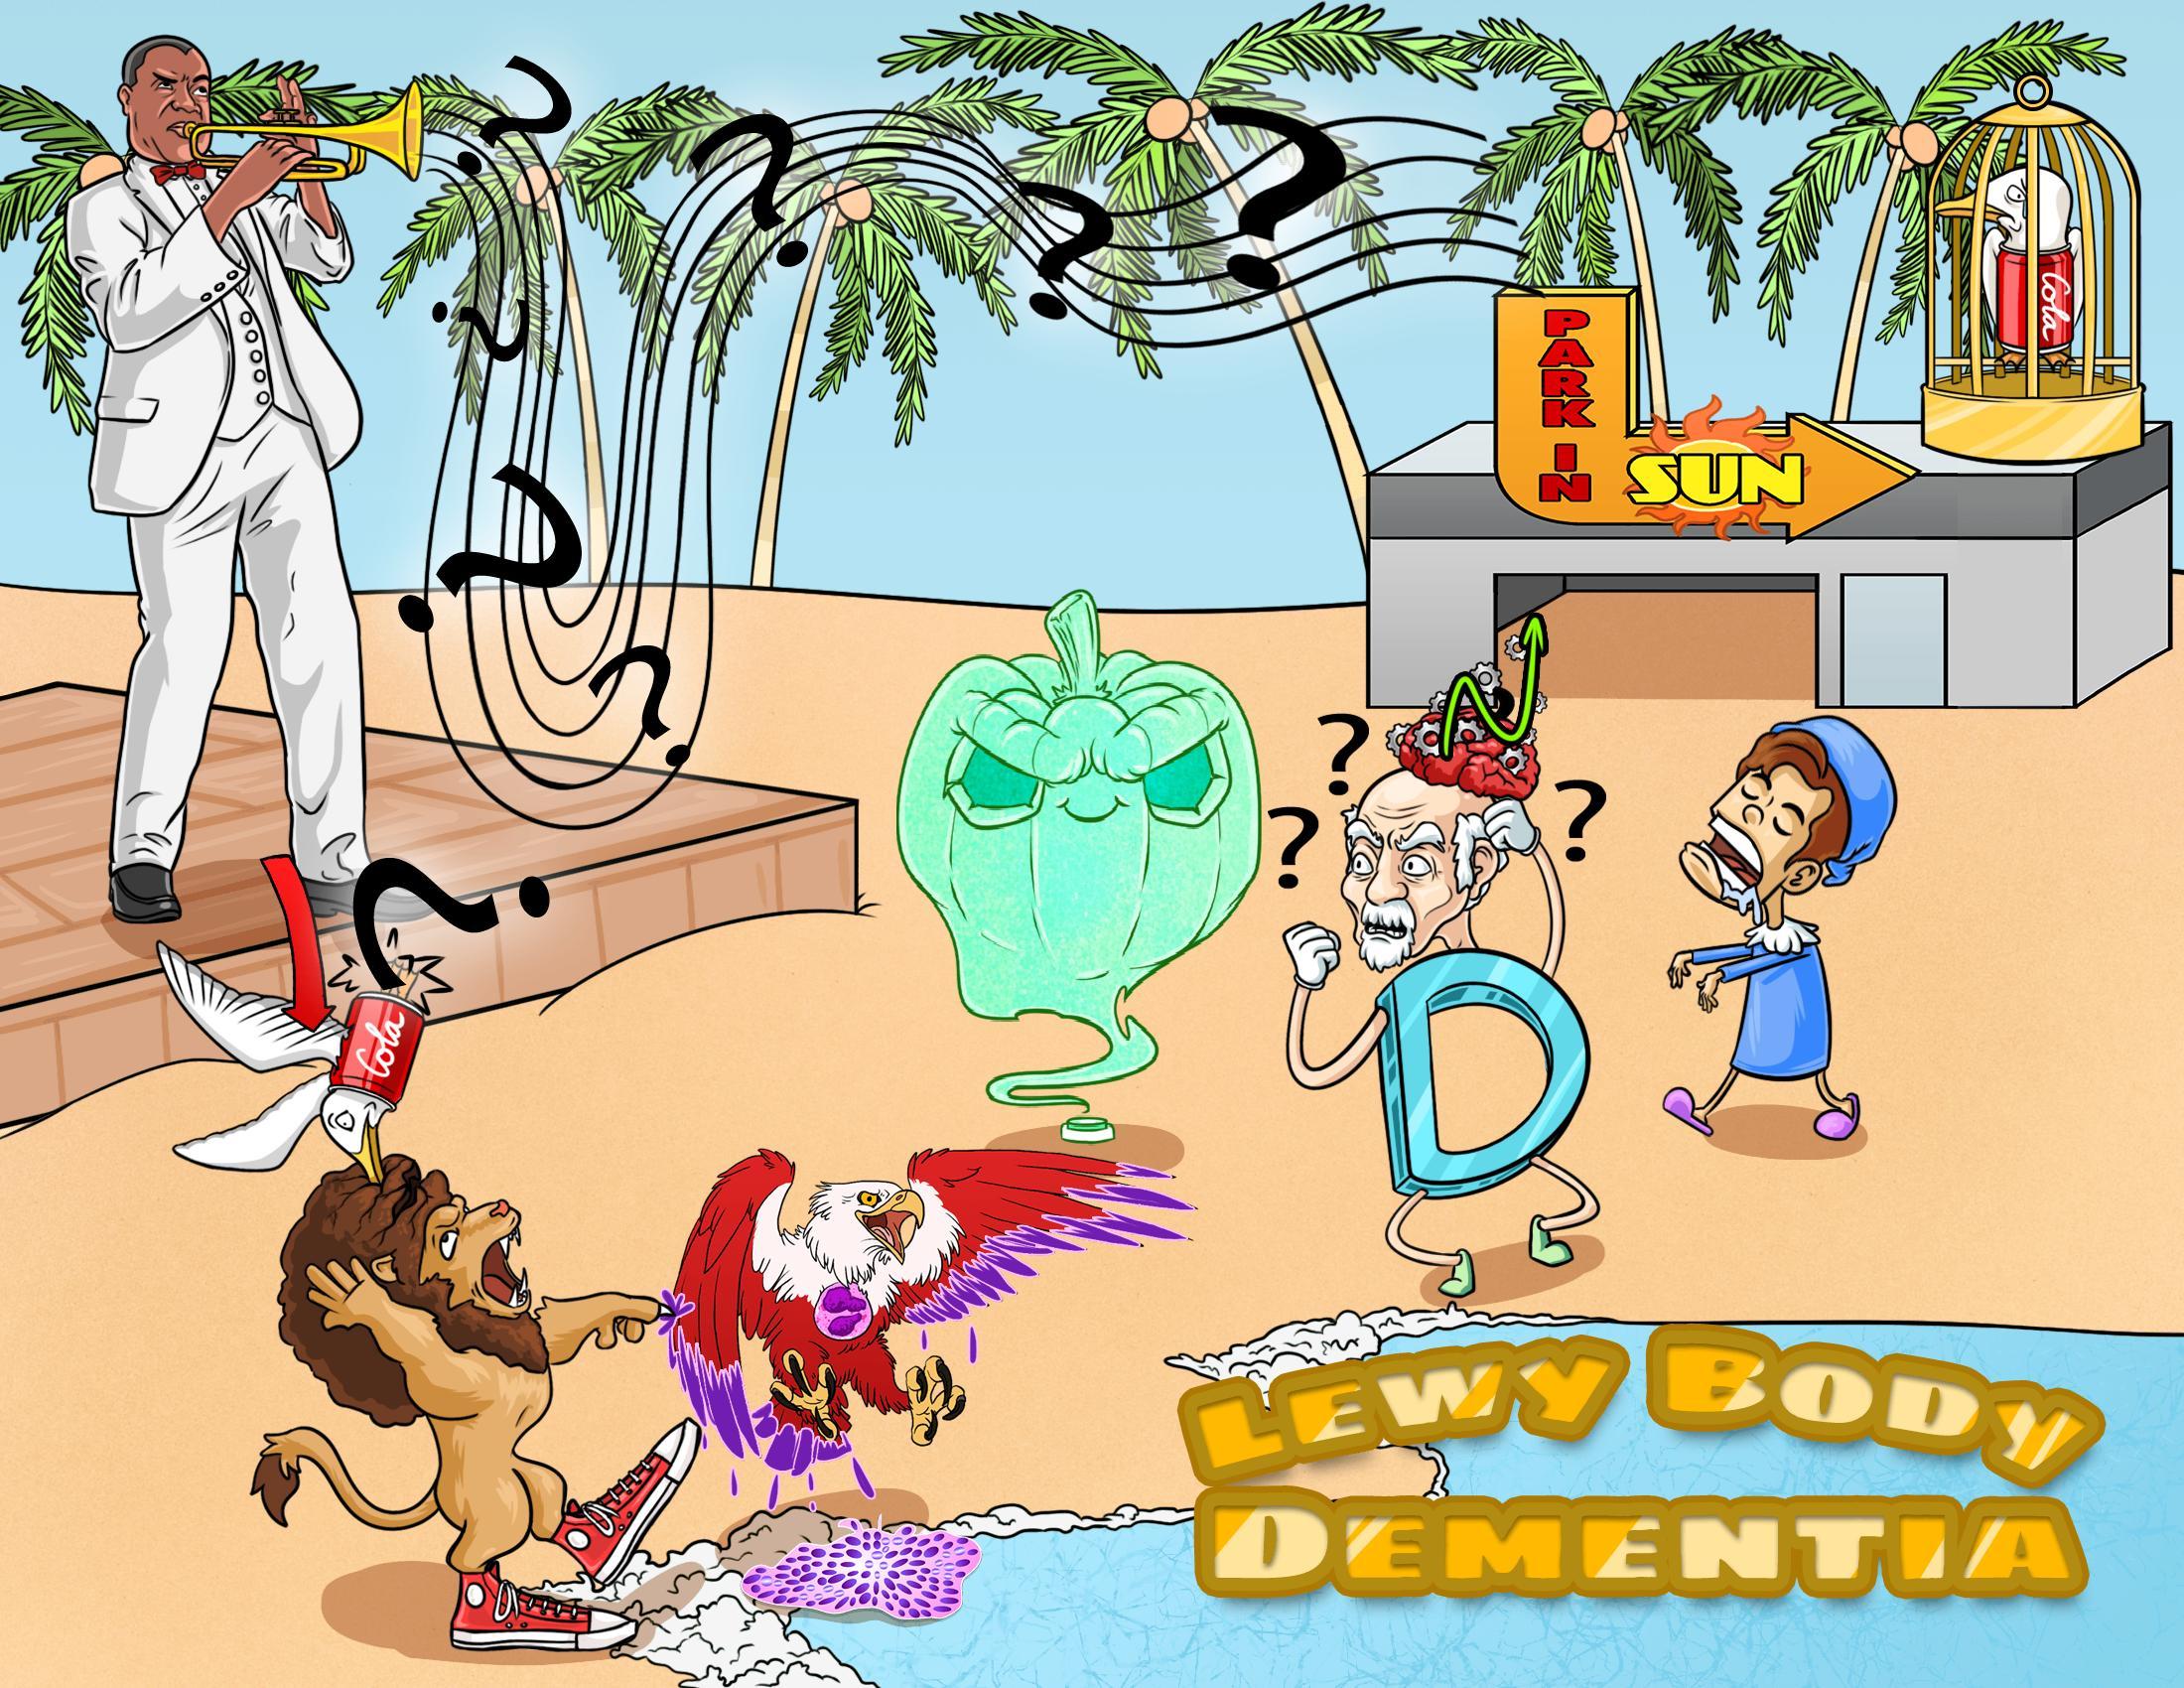 Lewy Body Dementia